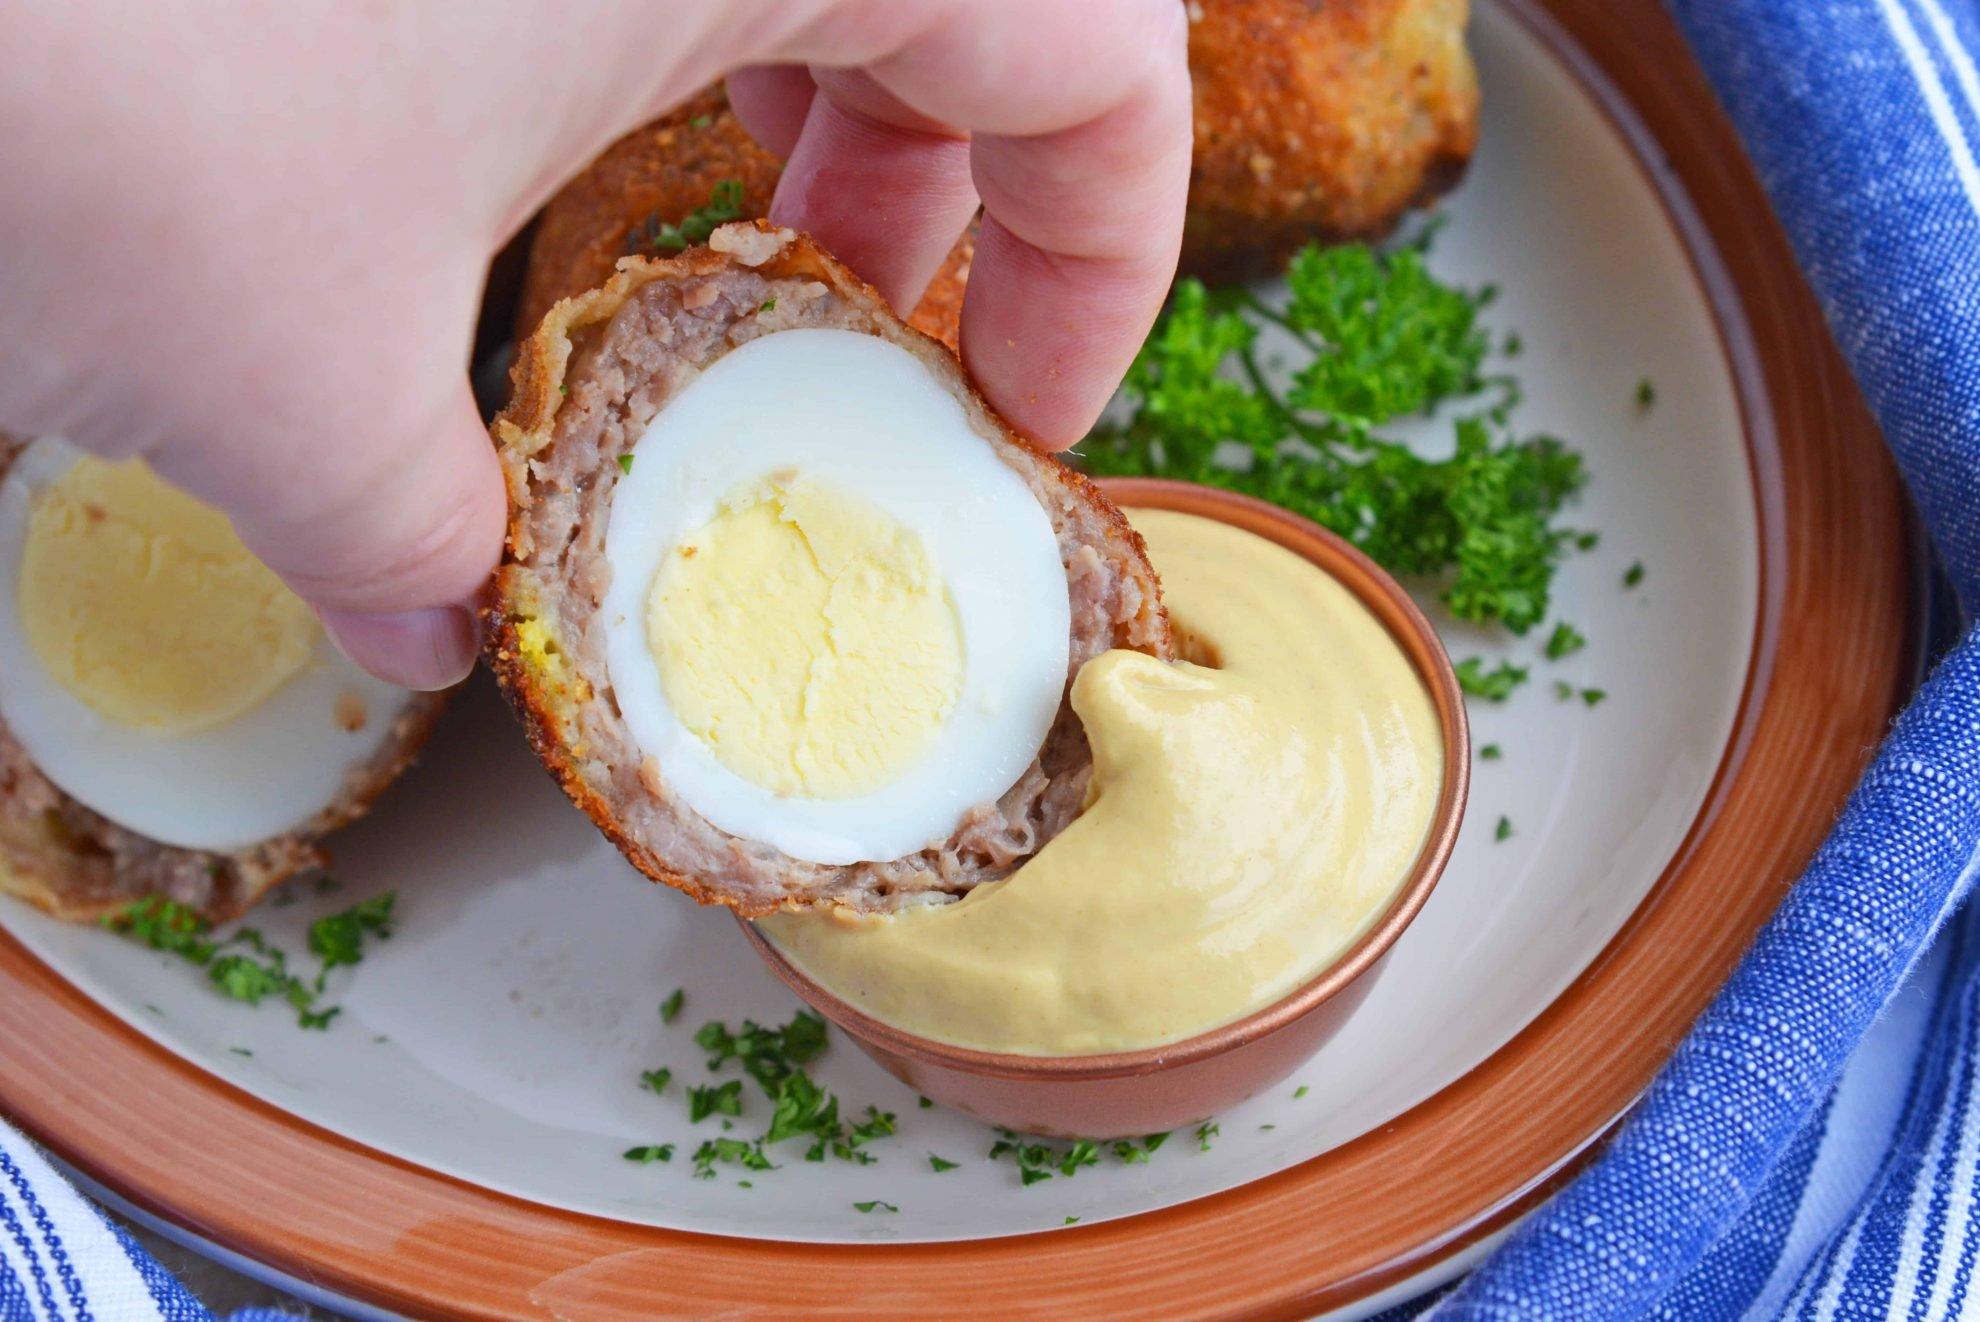 Scotch Egg dipping in Dijon mustard